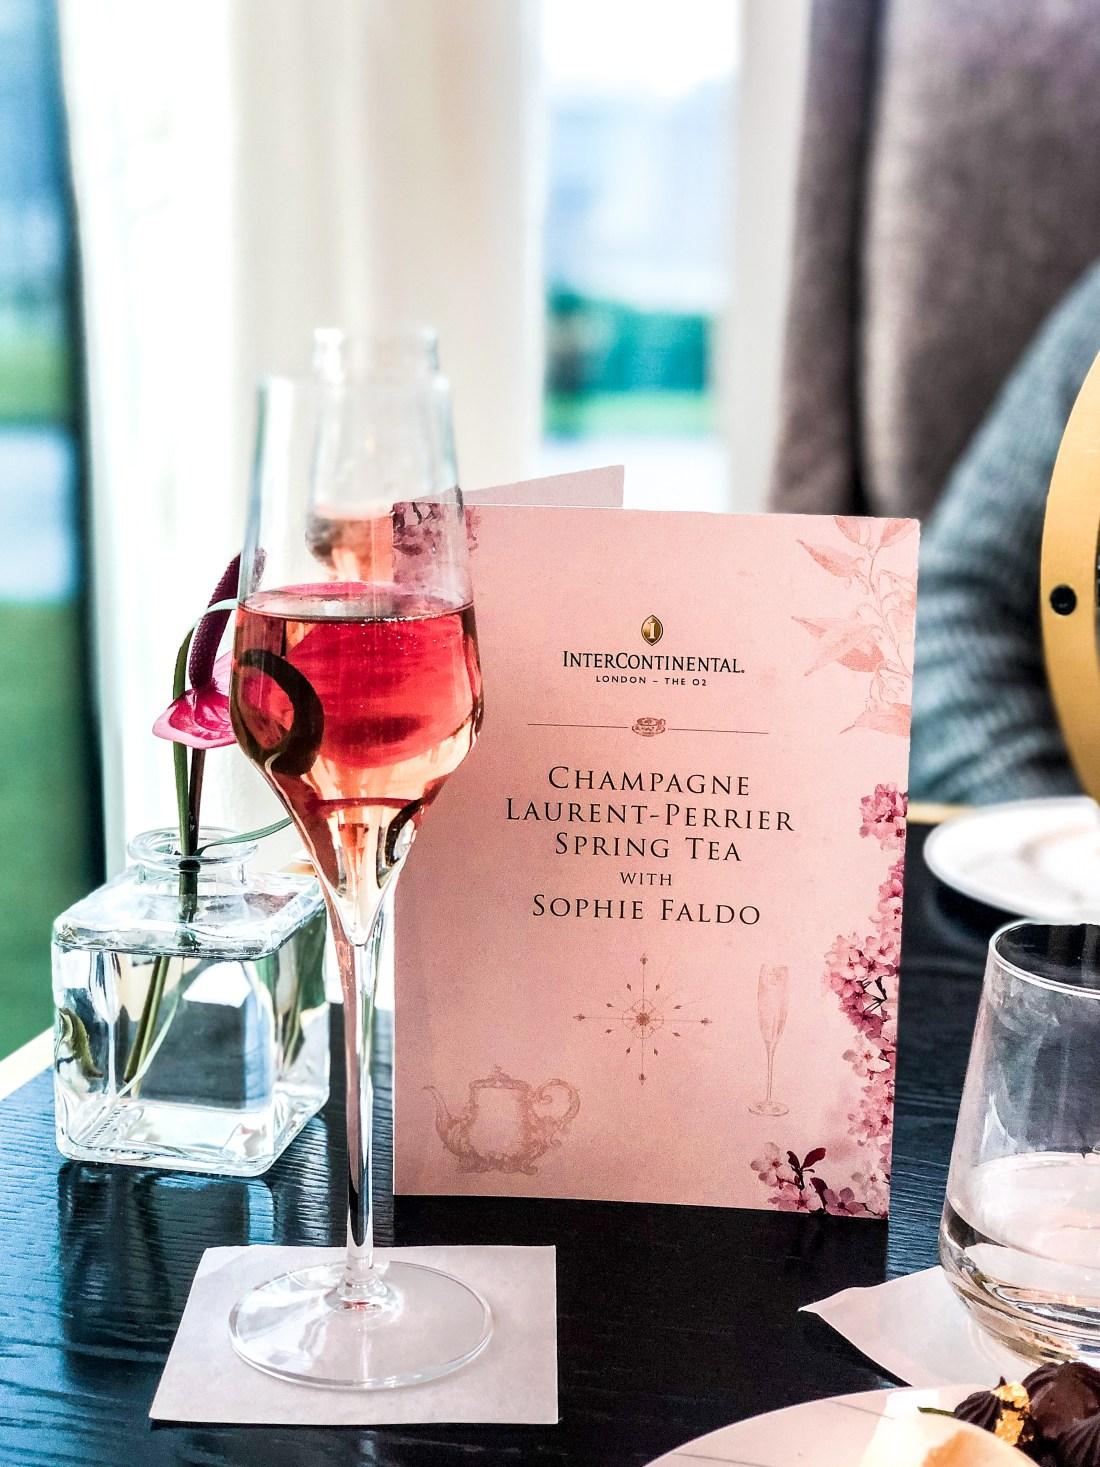 Laurent Perrier Afternoon Tea Sophie Faldo InterContinental O2 - The LDN Diaries